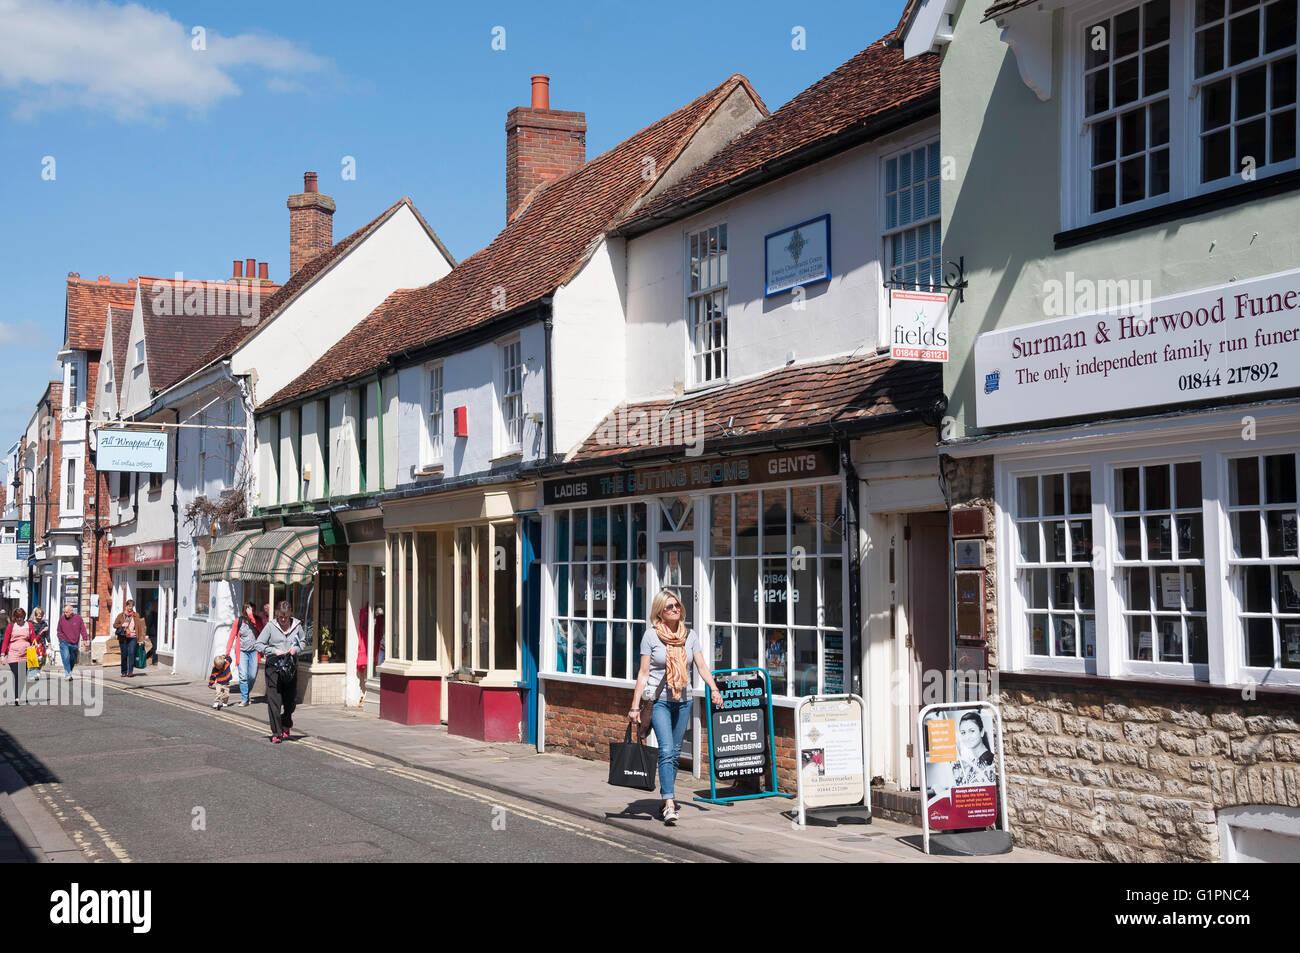 Butter Market, Thame, Oxfordshire, England, United Kingdom - Stock Image